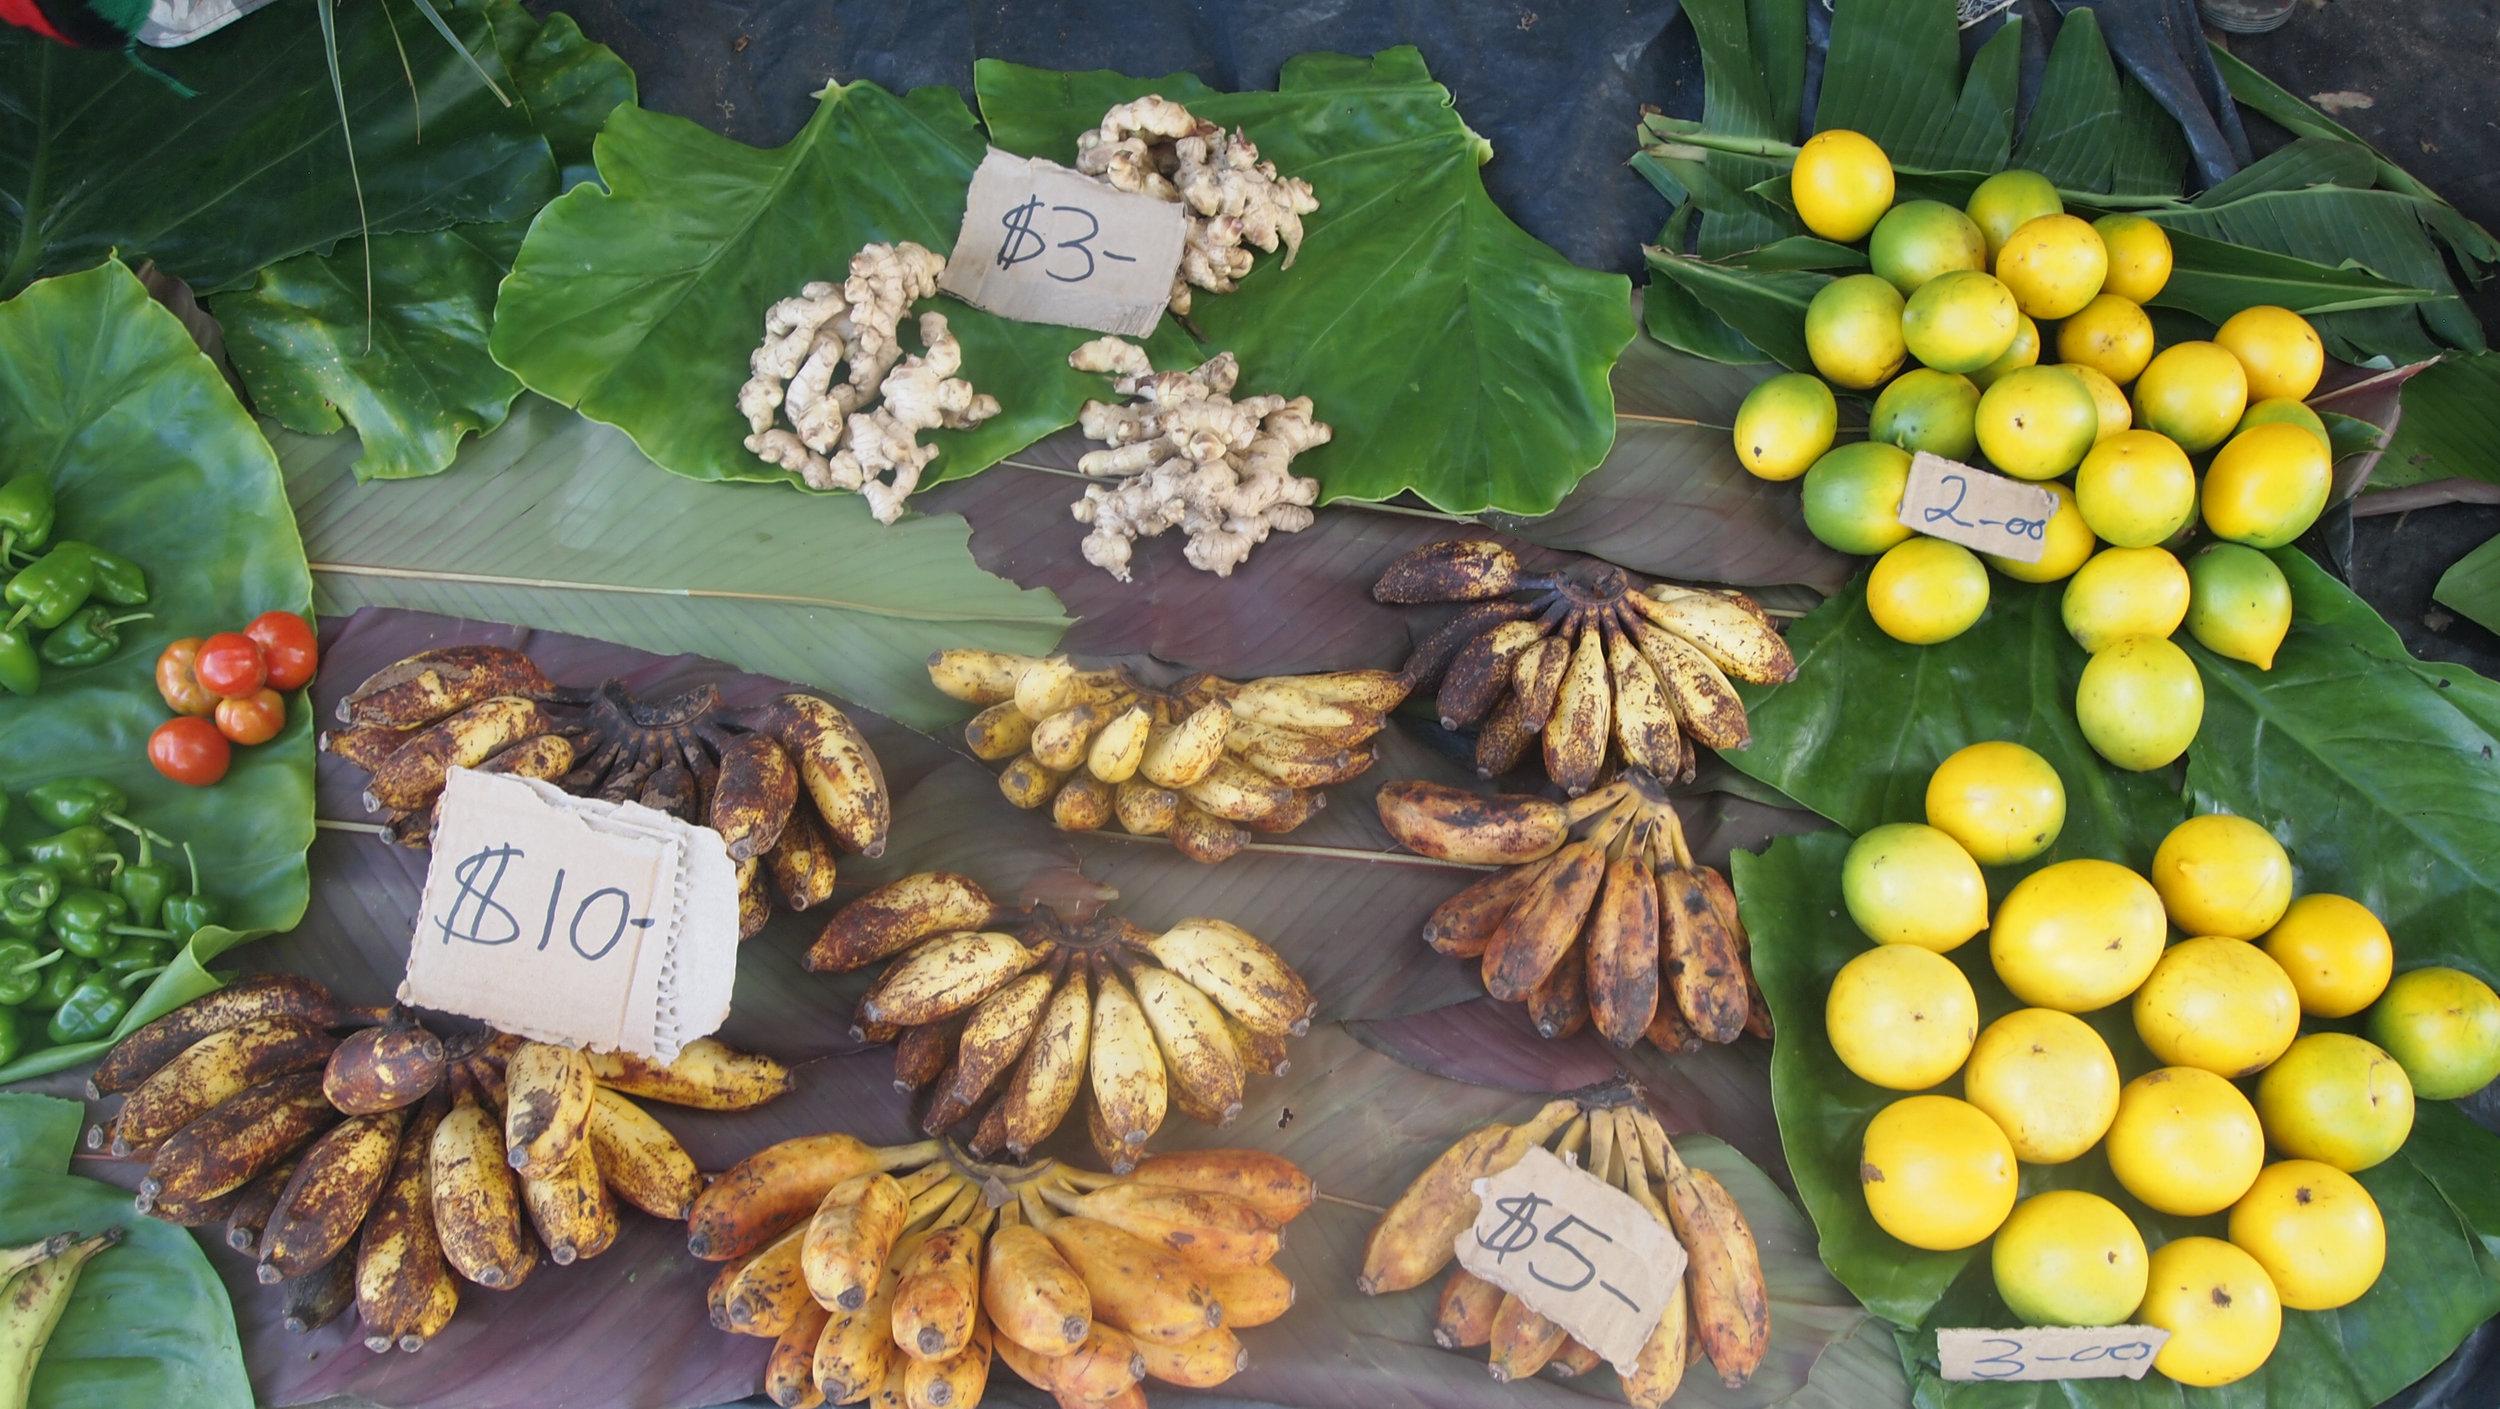 Gizo waterfront market produce (image by Jacqui Gibson).